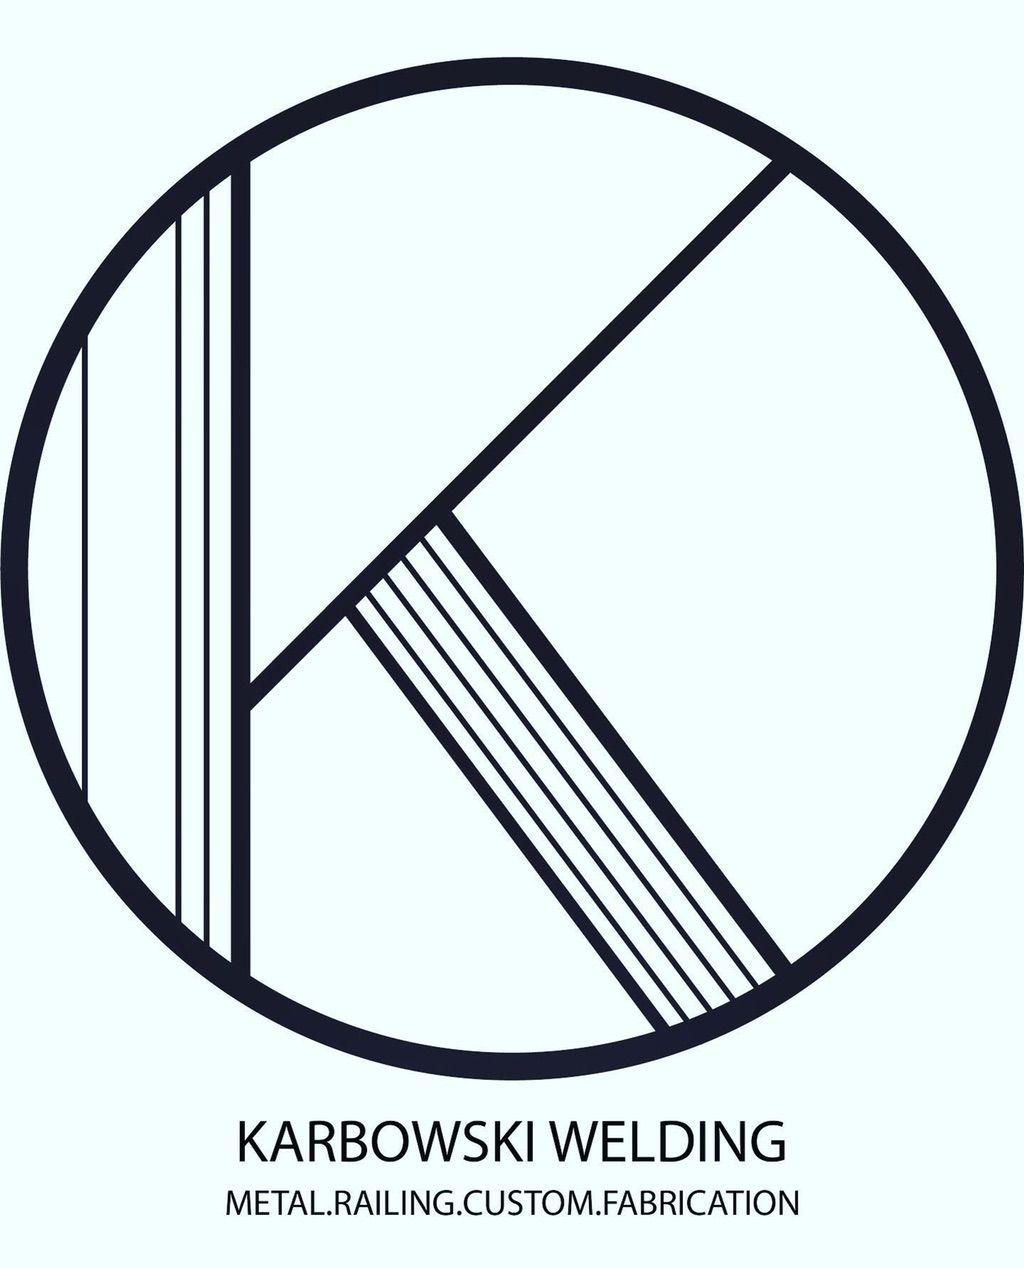 Karbowski Welding